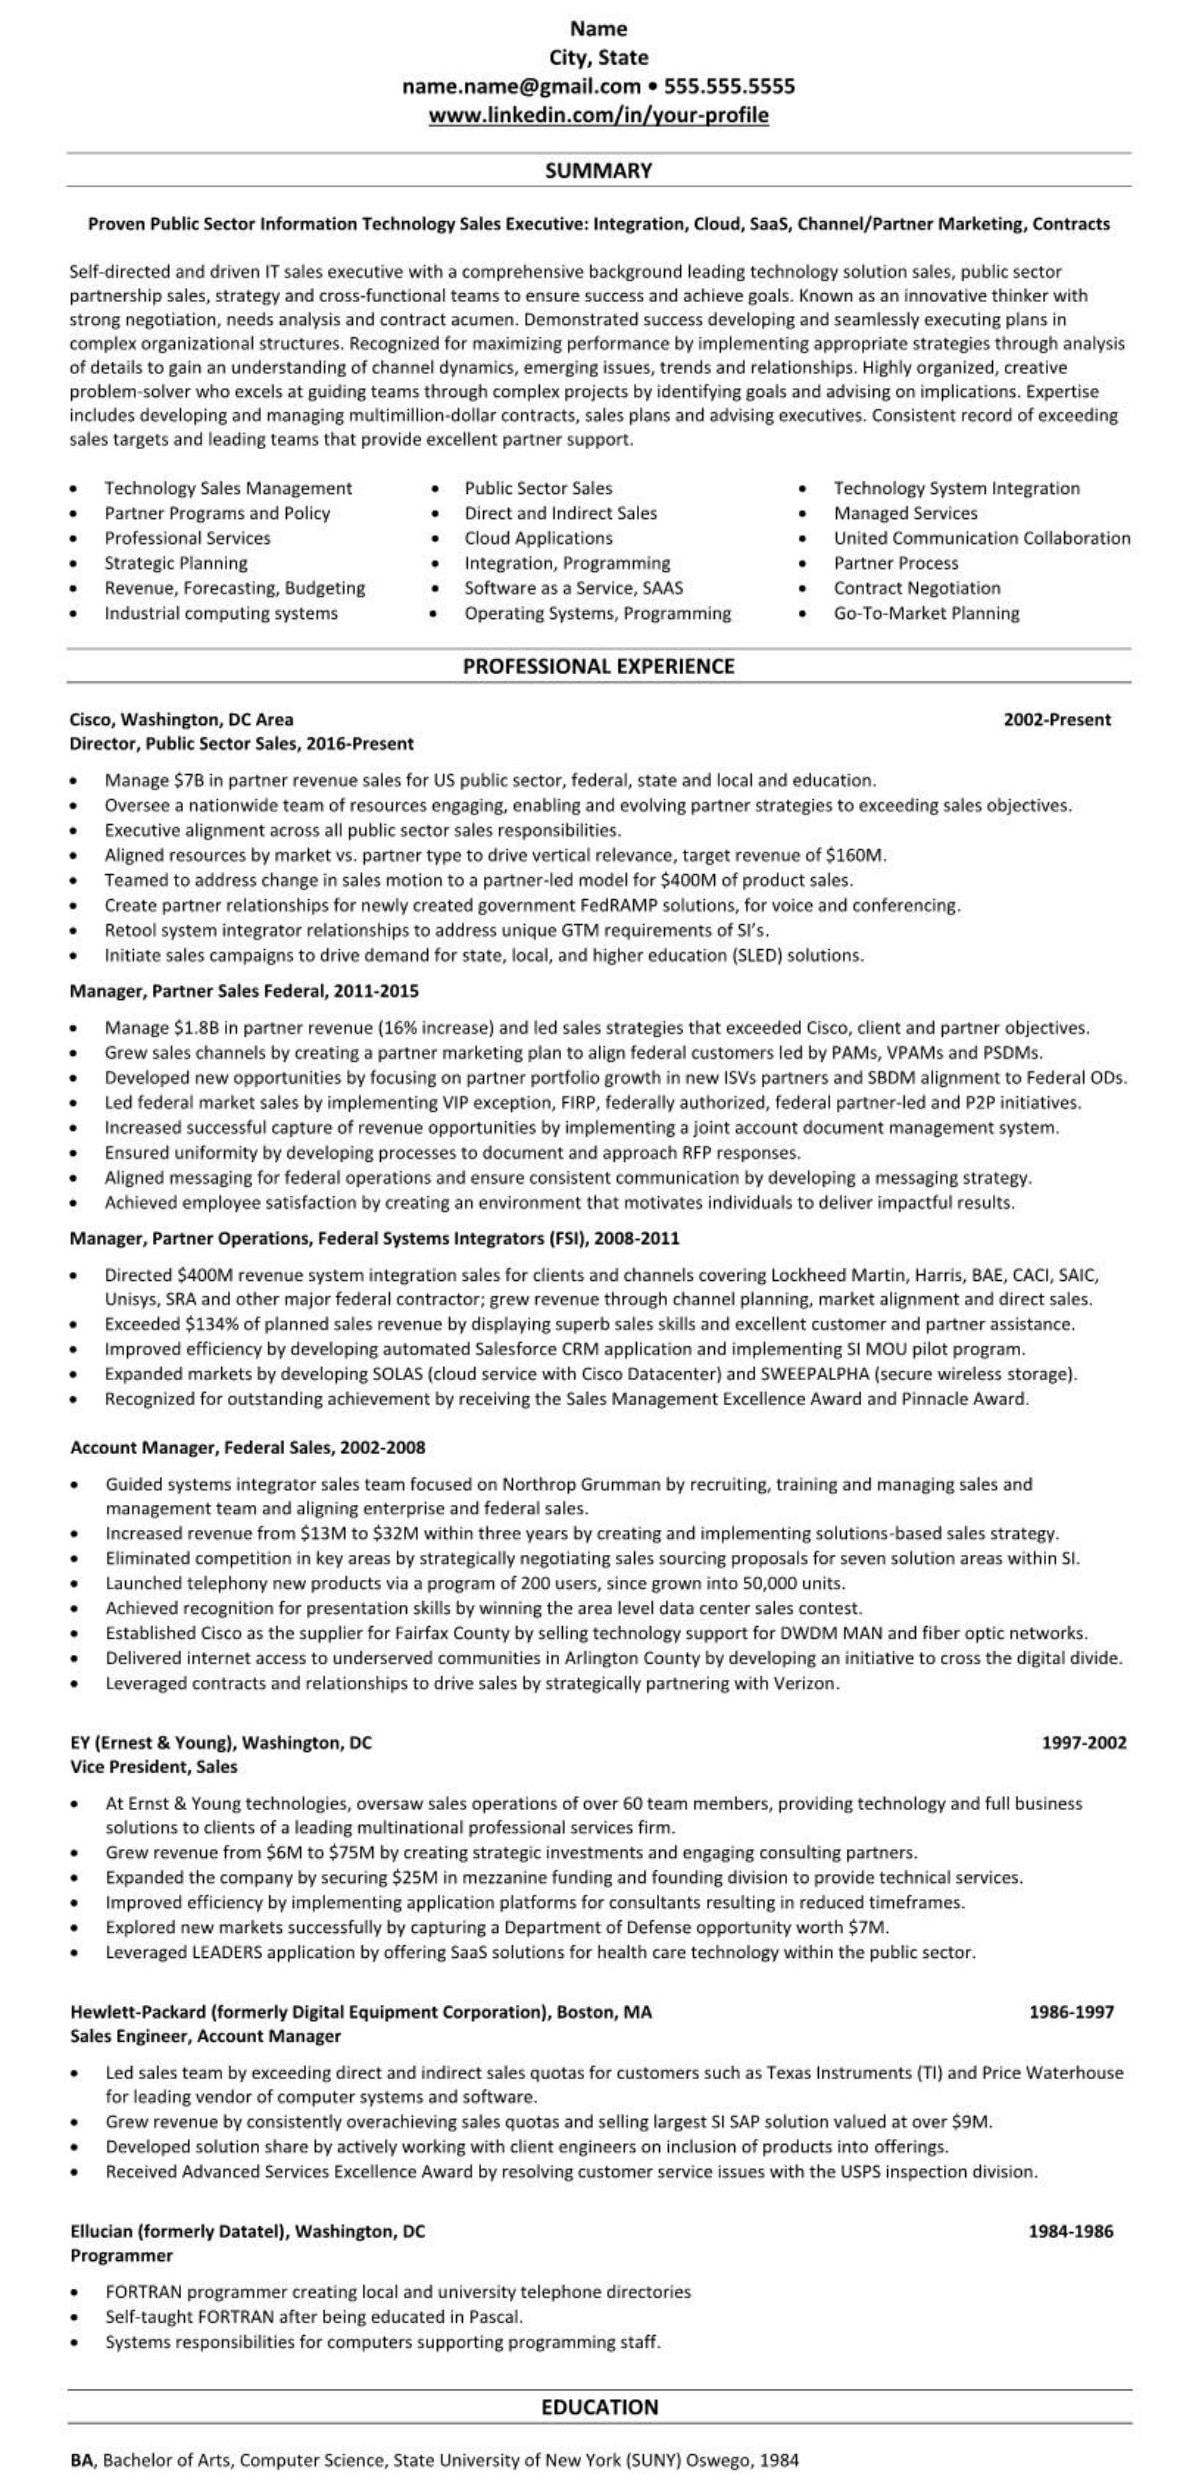 Resume 1818